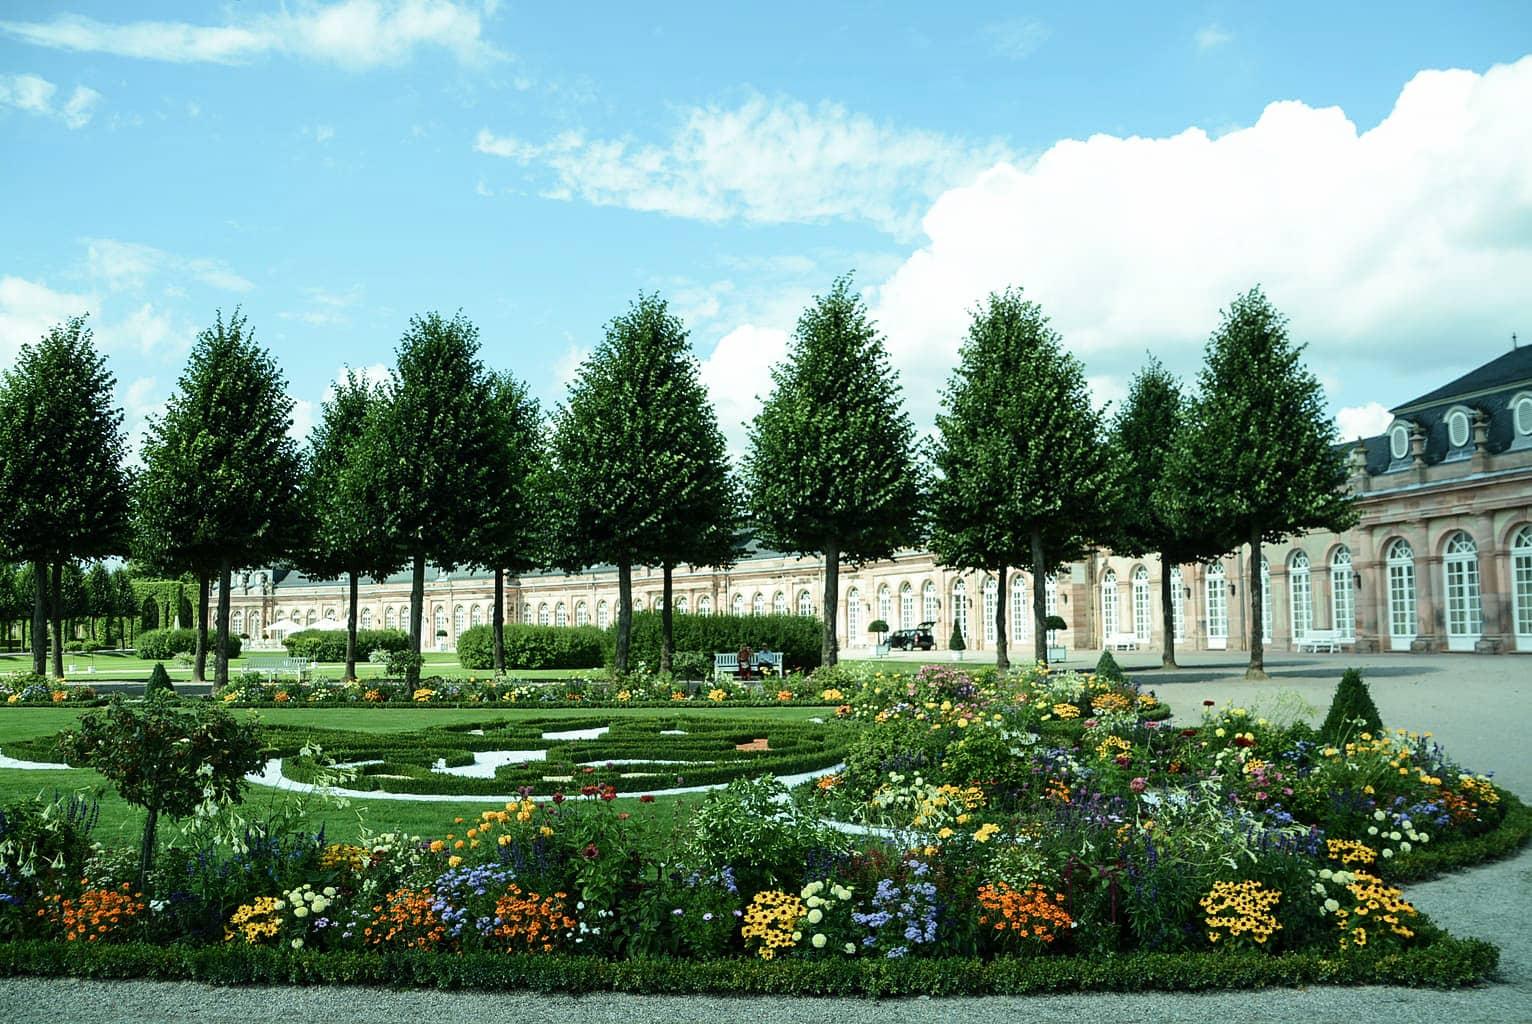 Prachitge bloemen en speelse bomenkolonien in Kasteeltuin Schwetzingen